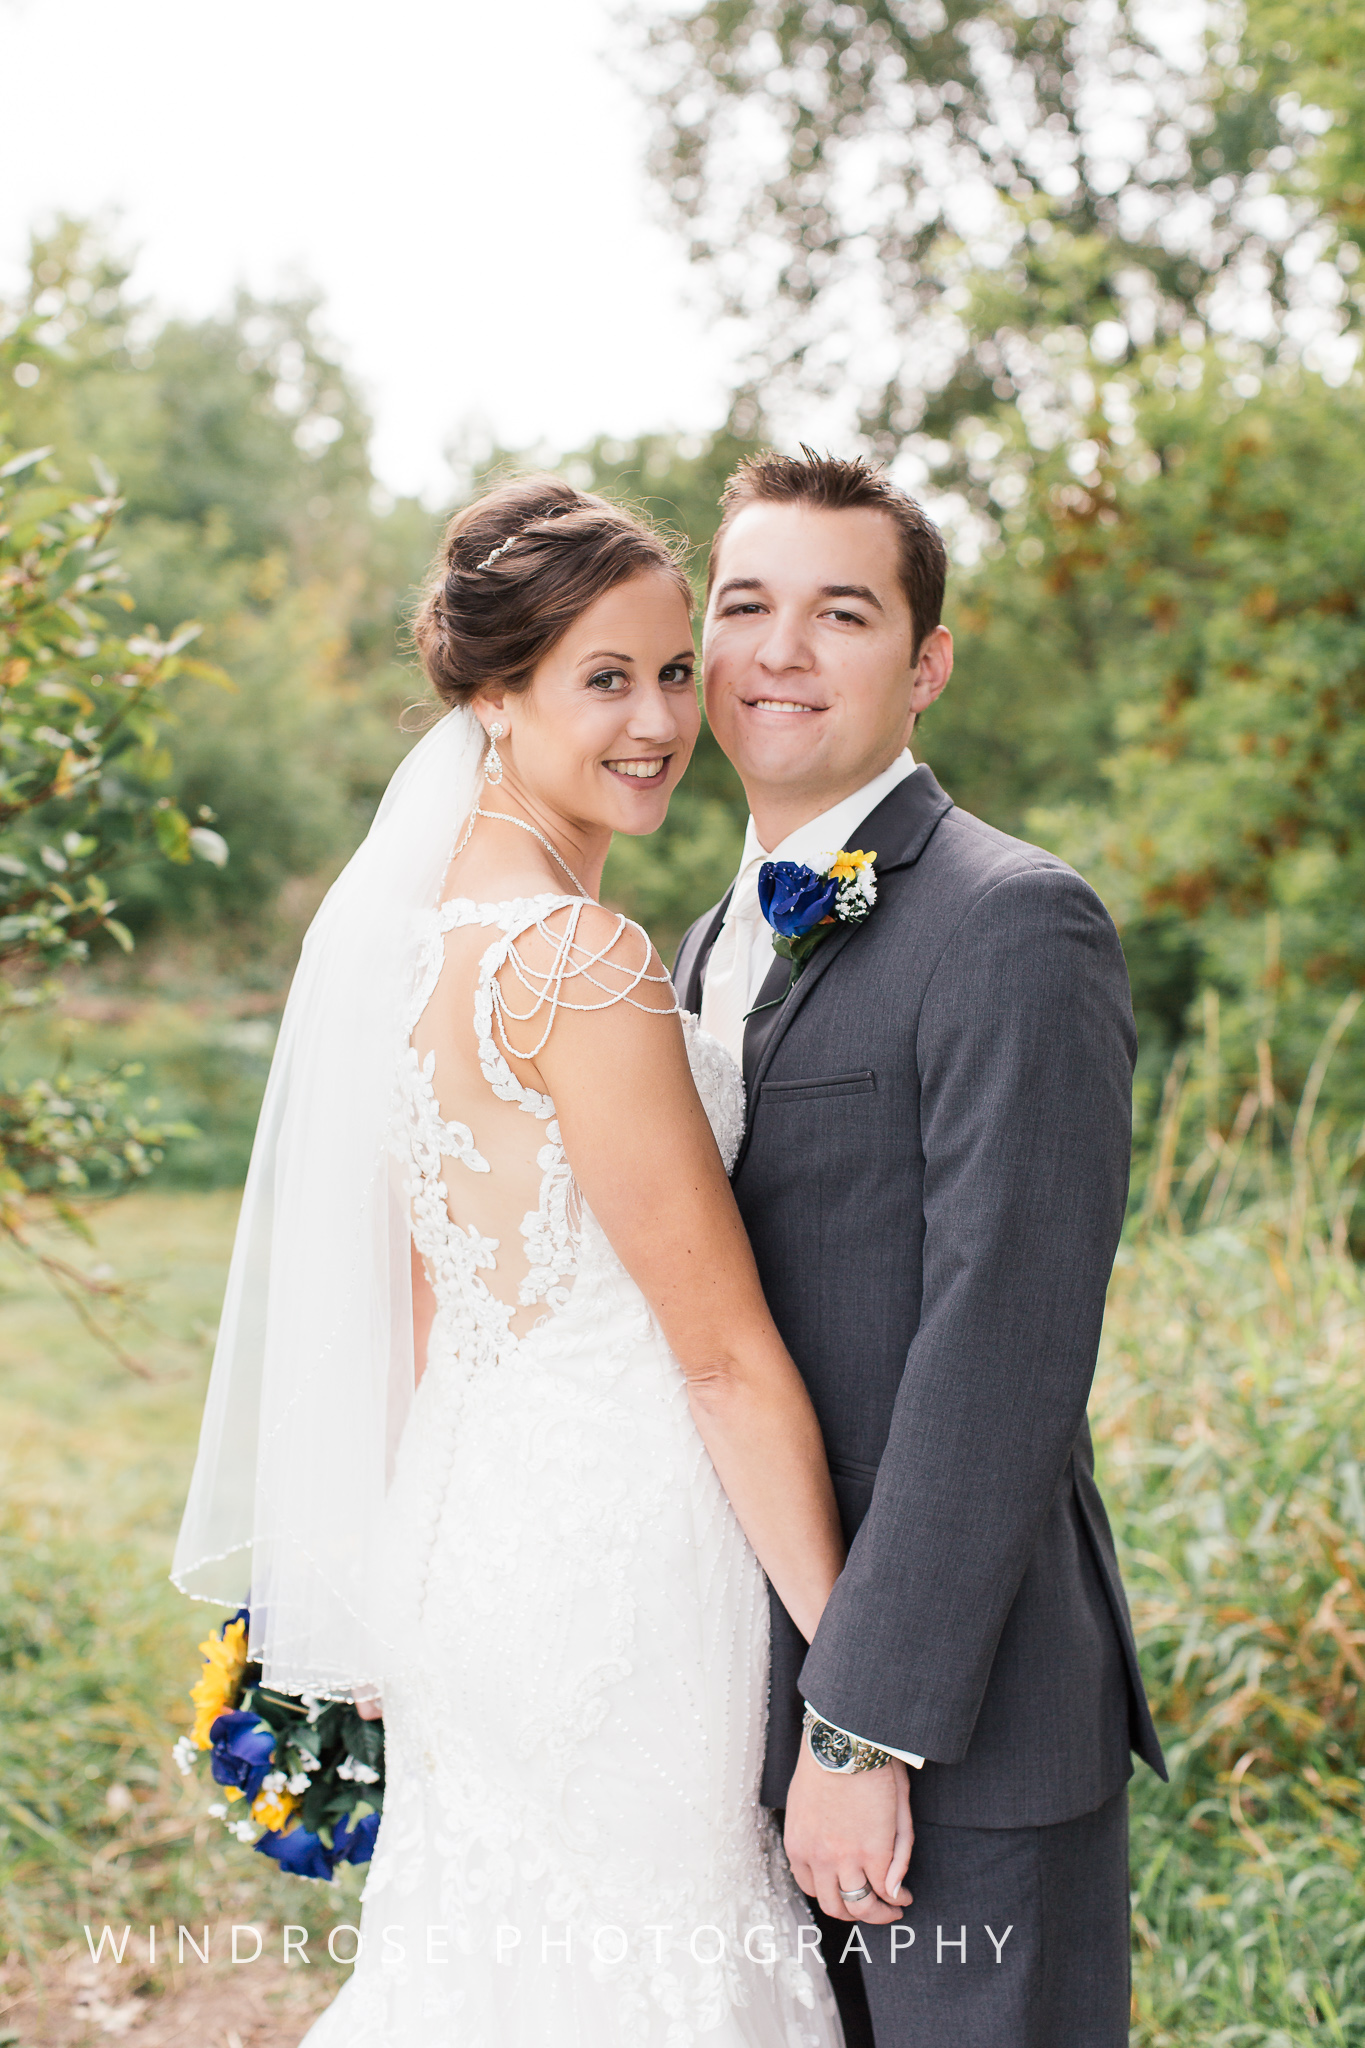 La-Crosse-Country-Club-Wedding-Minnesota-Wedding-Photographer-13.jpg